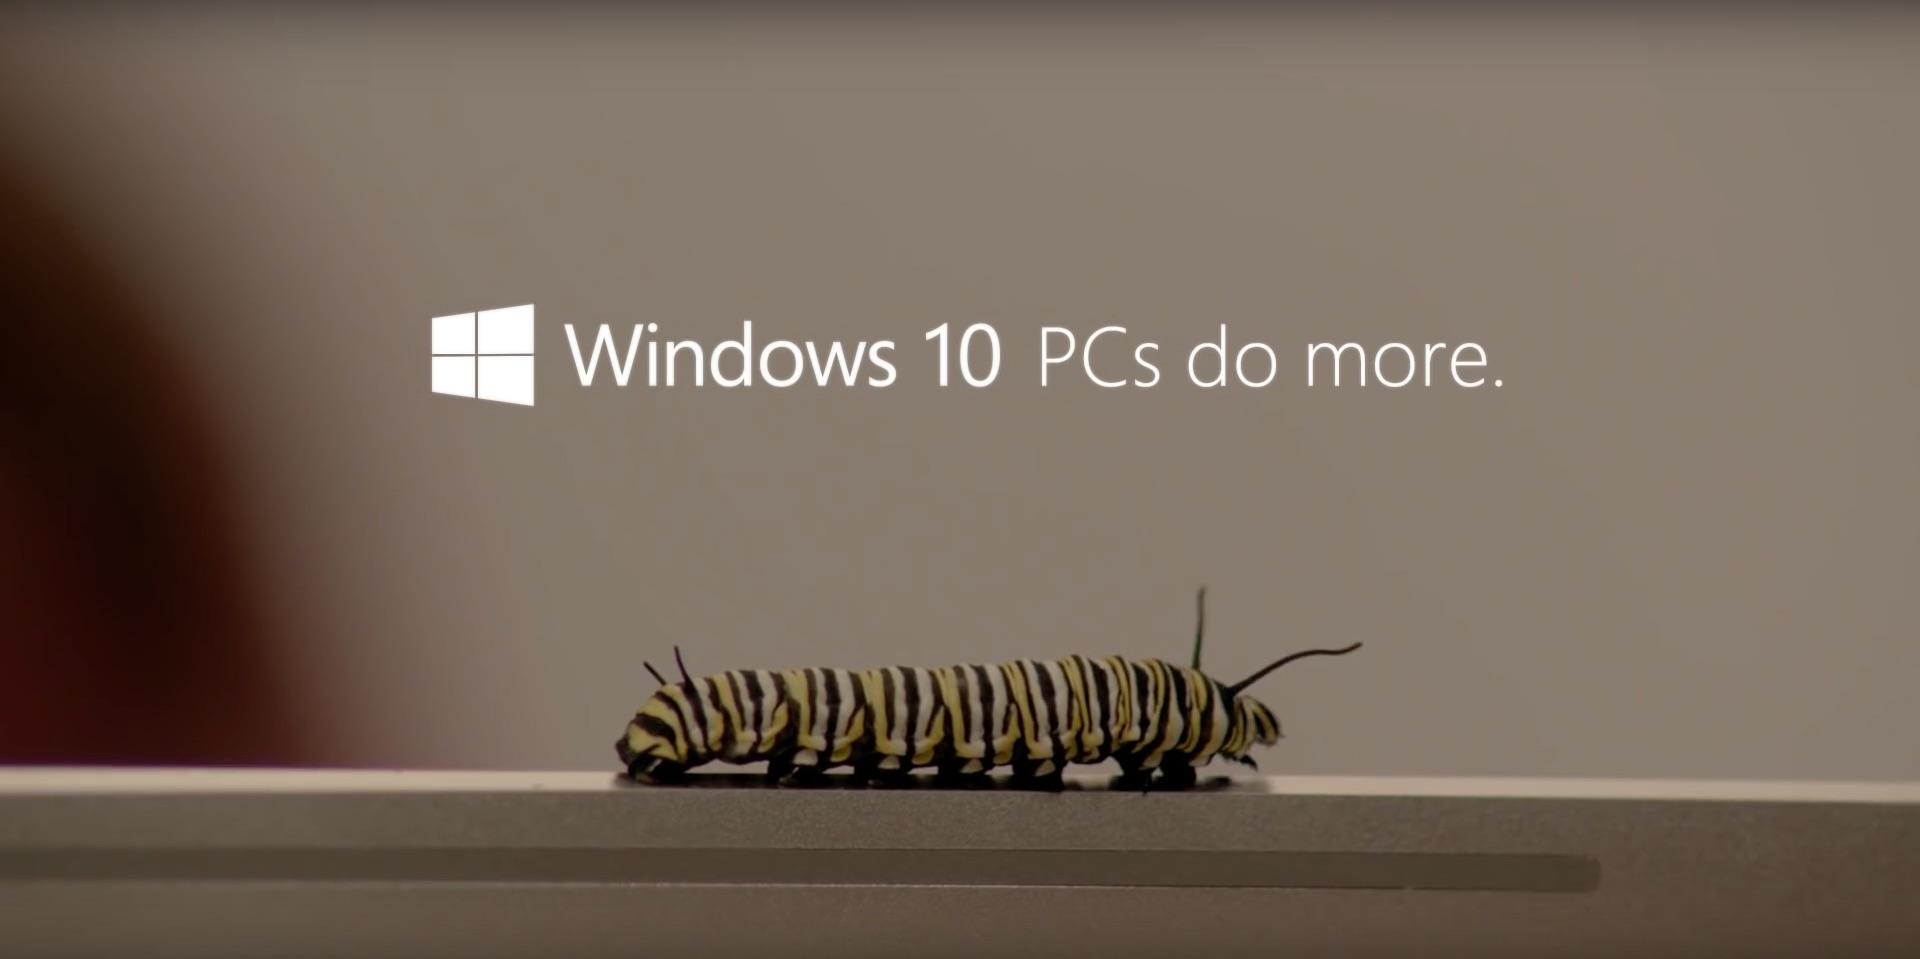 Windows 10 PCs do more Campagne